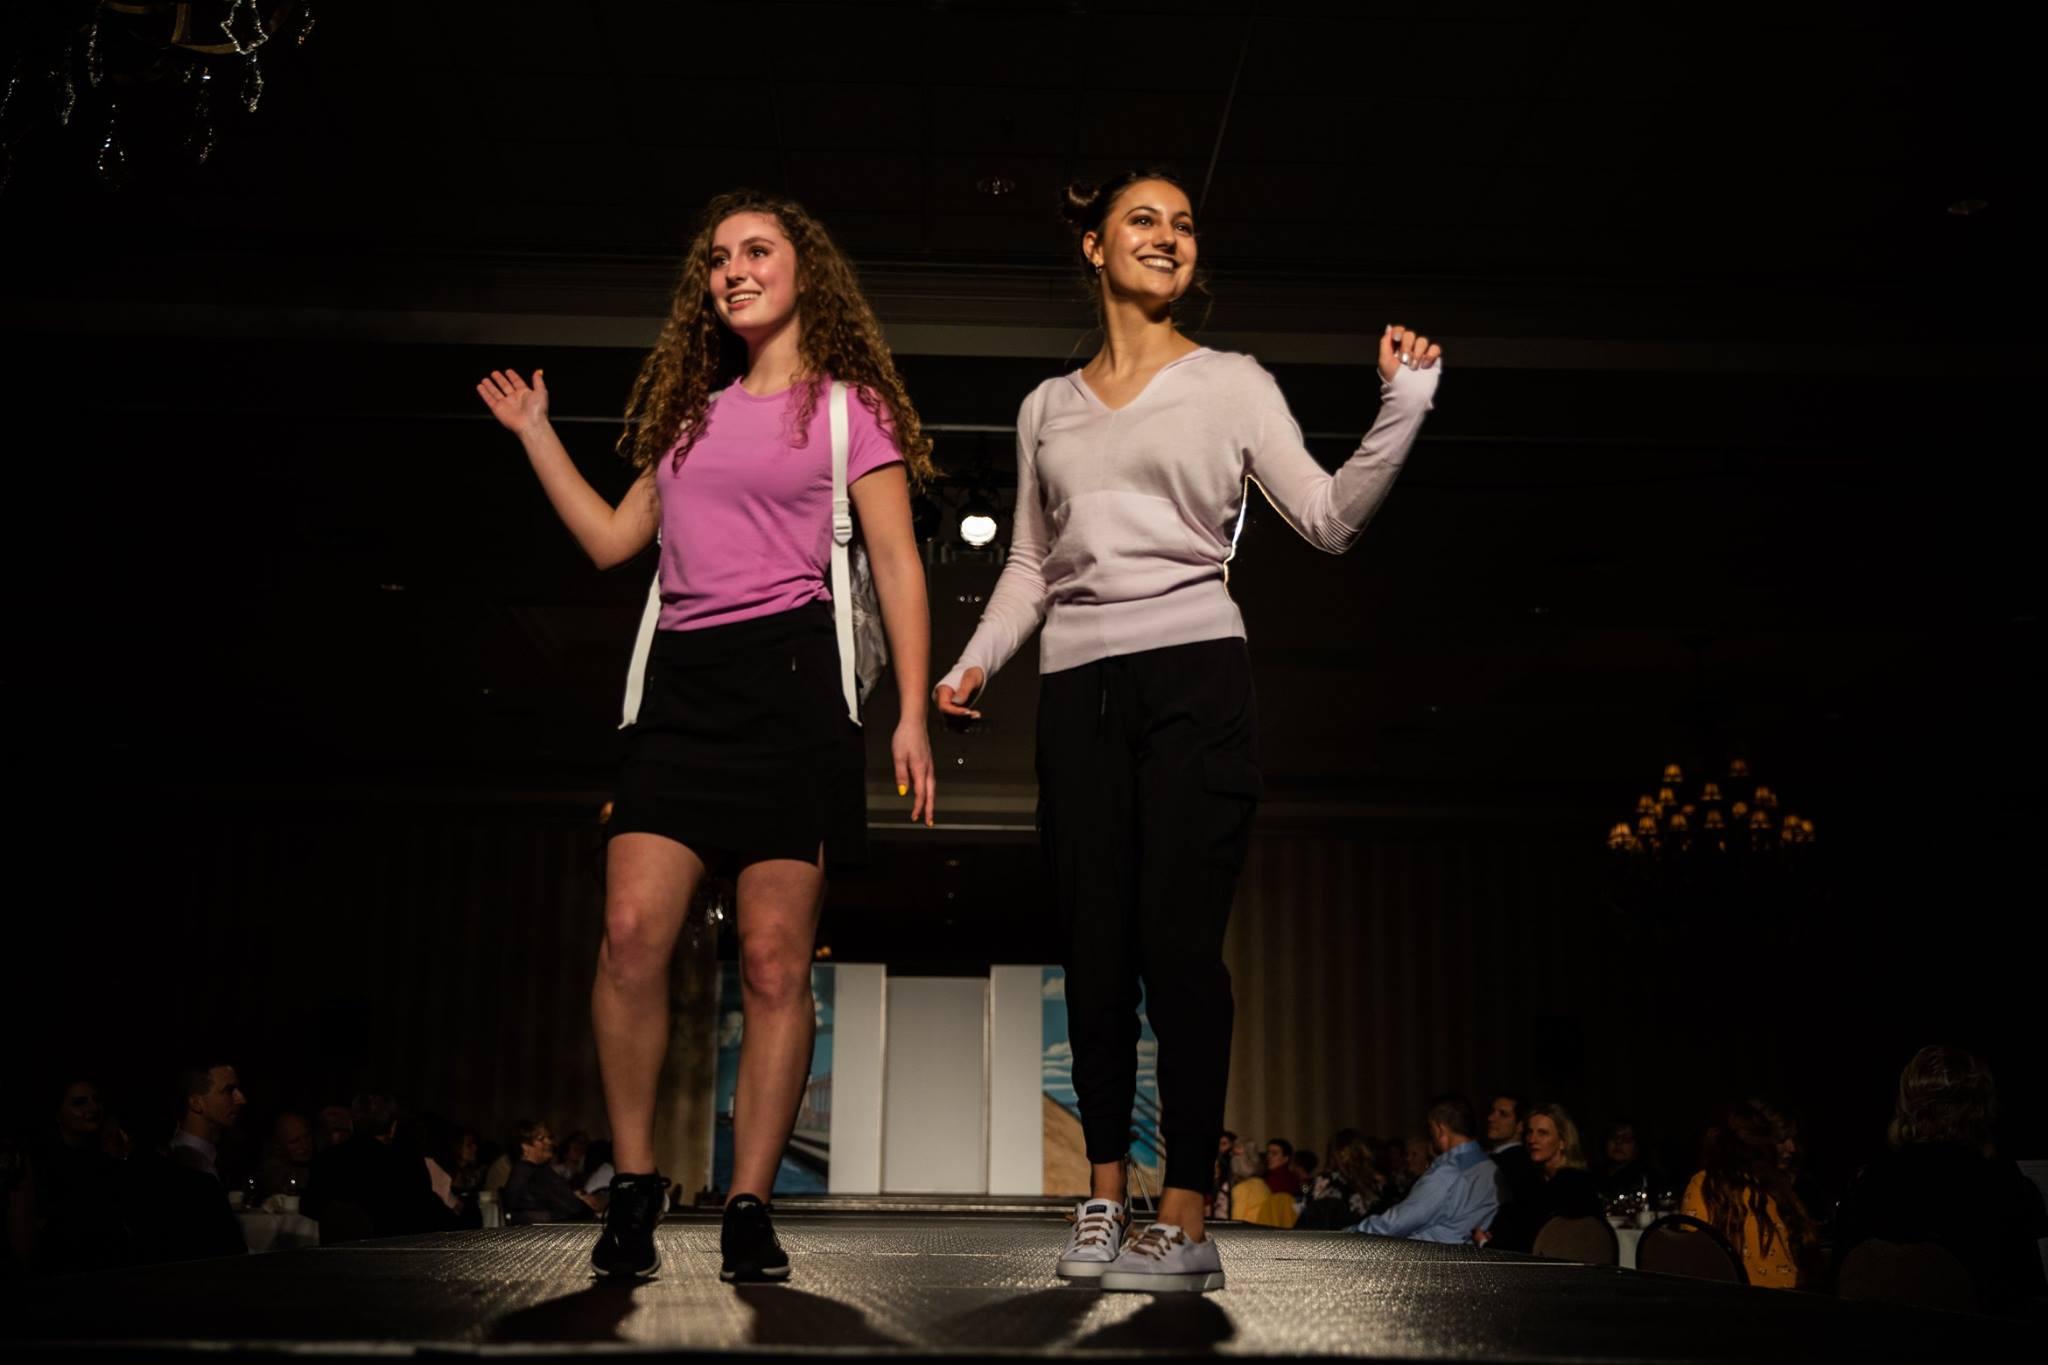 Lutheran_North_High_School_Macomb_Michigan_LHN_Fashion_Show_2019 (3).jpg